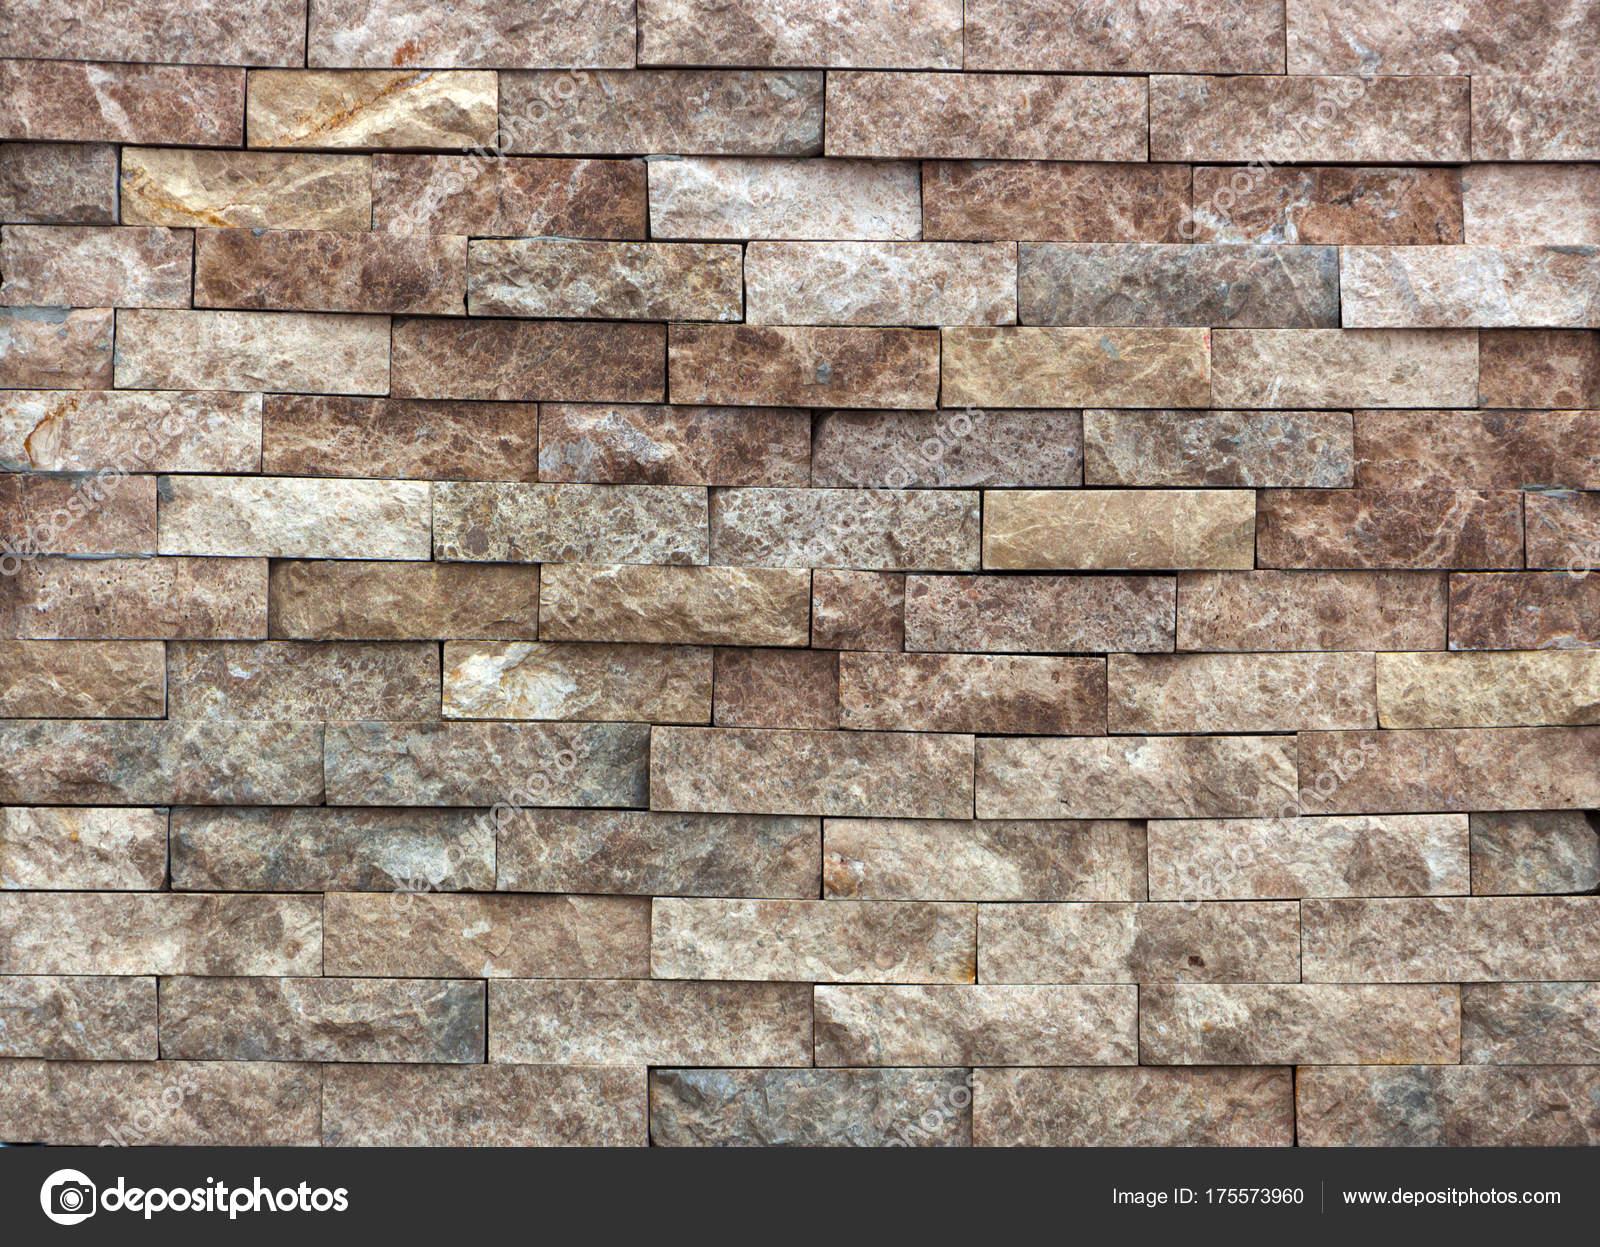 Emejing pierre naturelle d corative pictures joshkrajcik for Marmol material de construccion